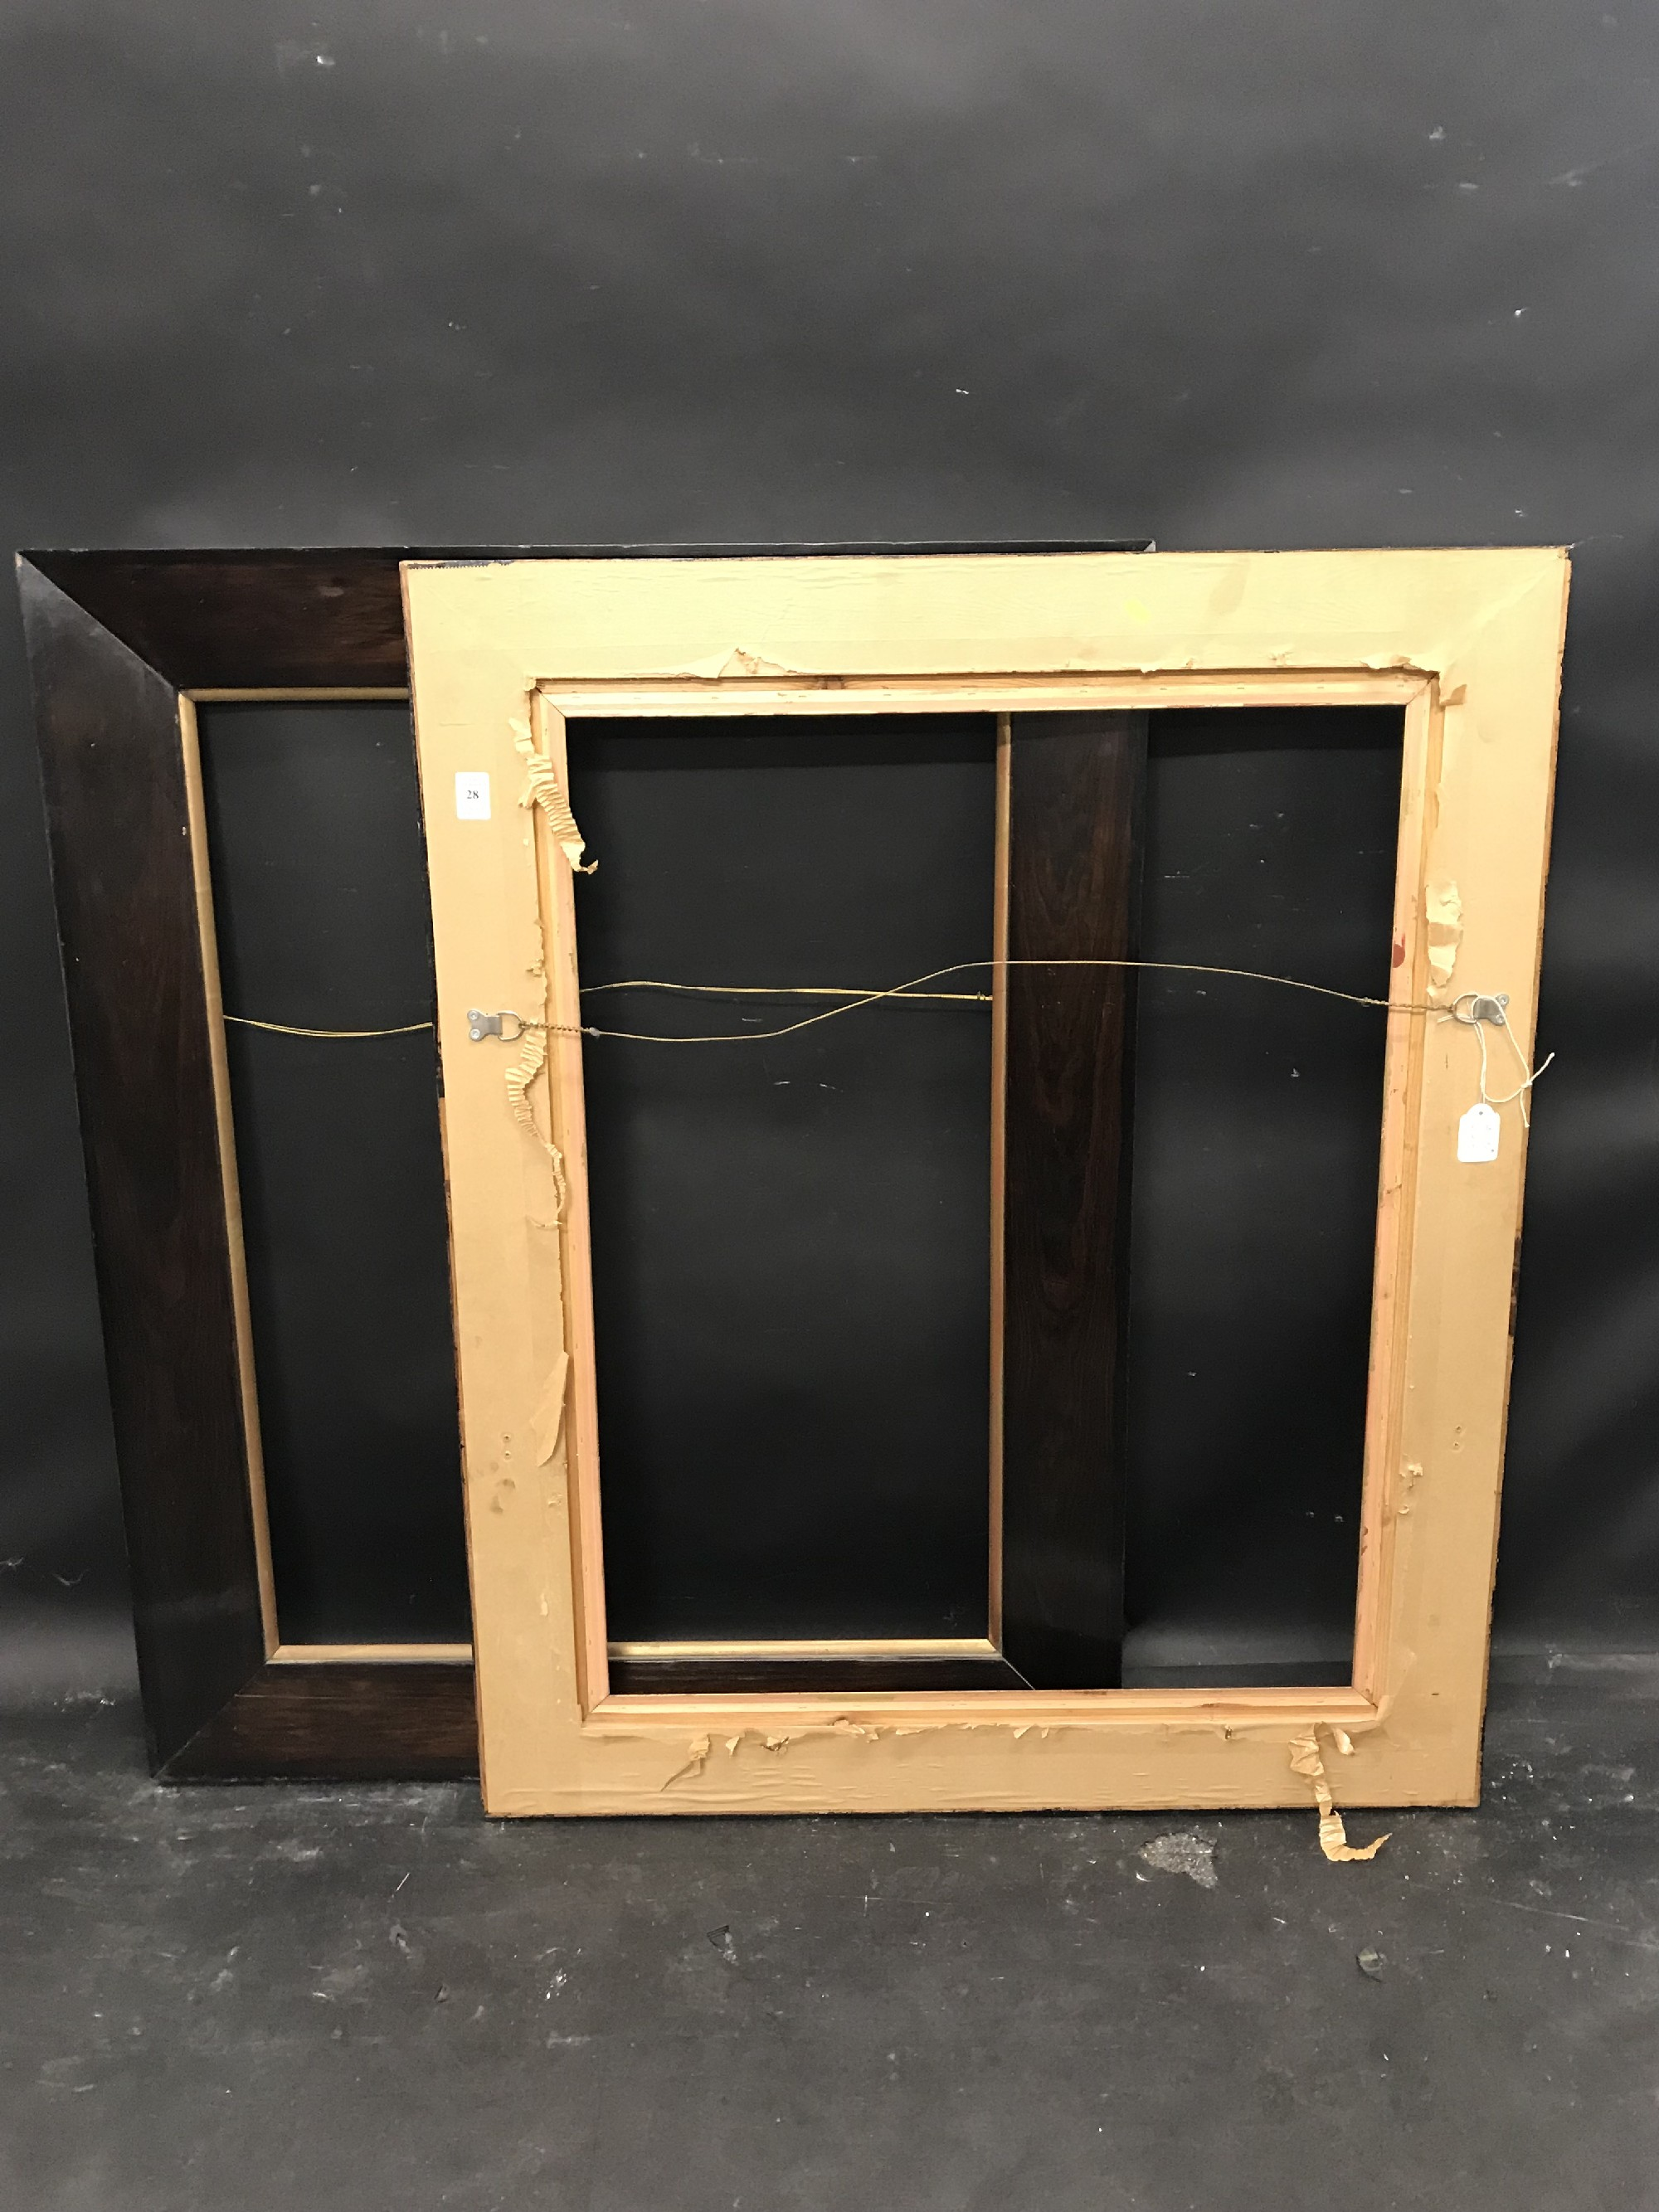 "Lot 28 - 20th Century English School. A Darkwood Frame, with a Gilt Slip, 30"" x 23.5"", and a companion piece,"